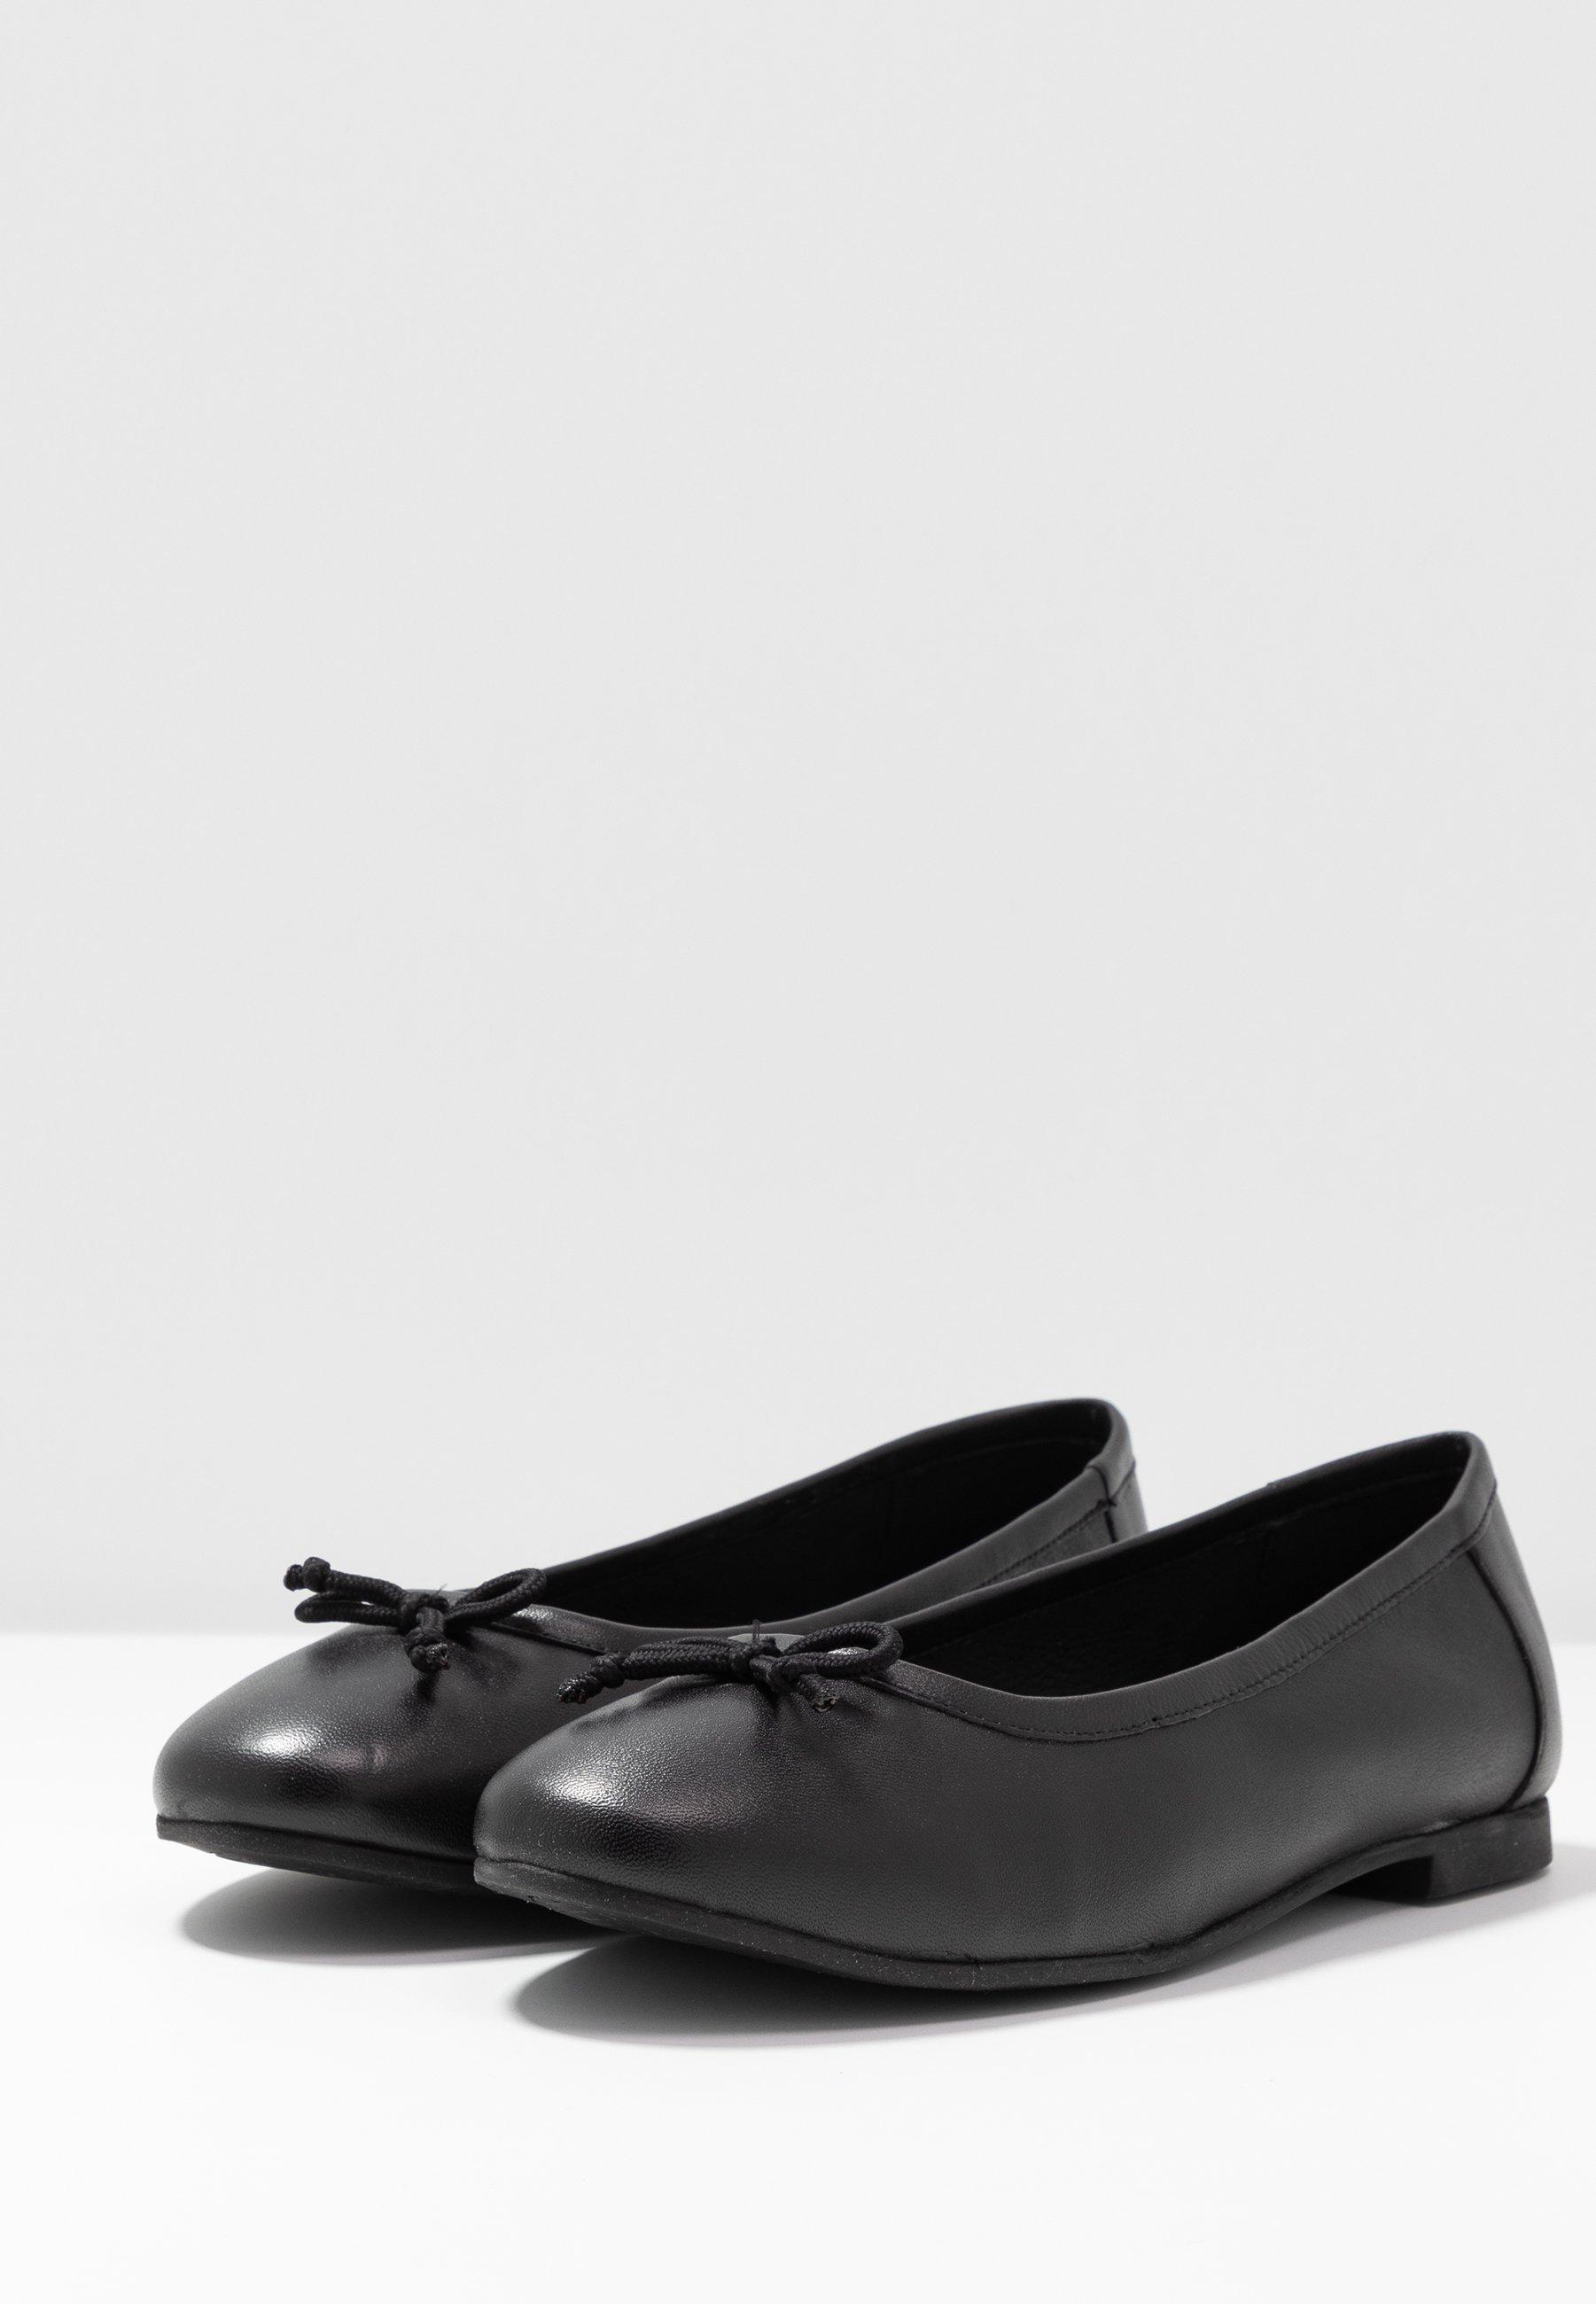 WIDE FIT Ballerina black